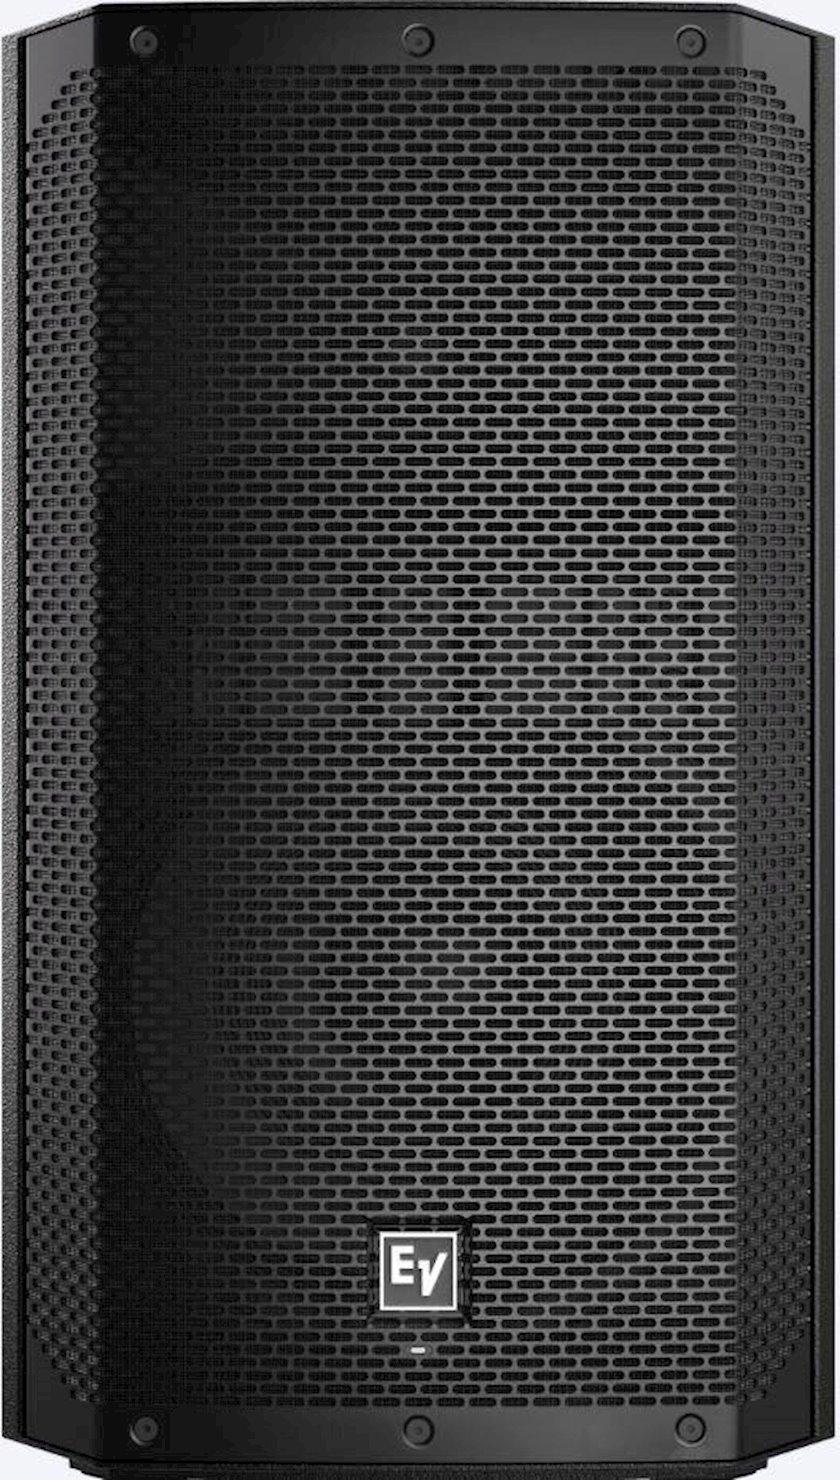 Yerüstü dinamik akustik sistem Electro-Voice ELX200-12P